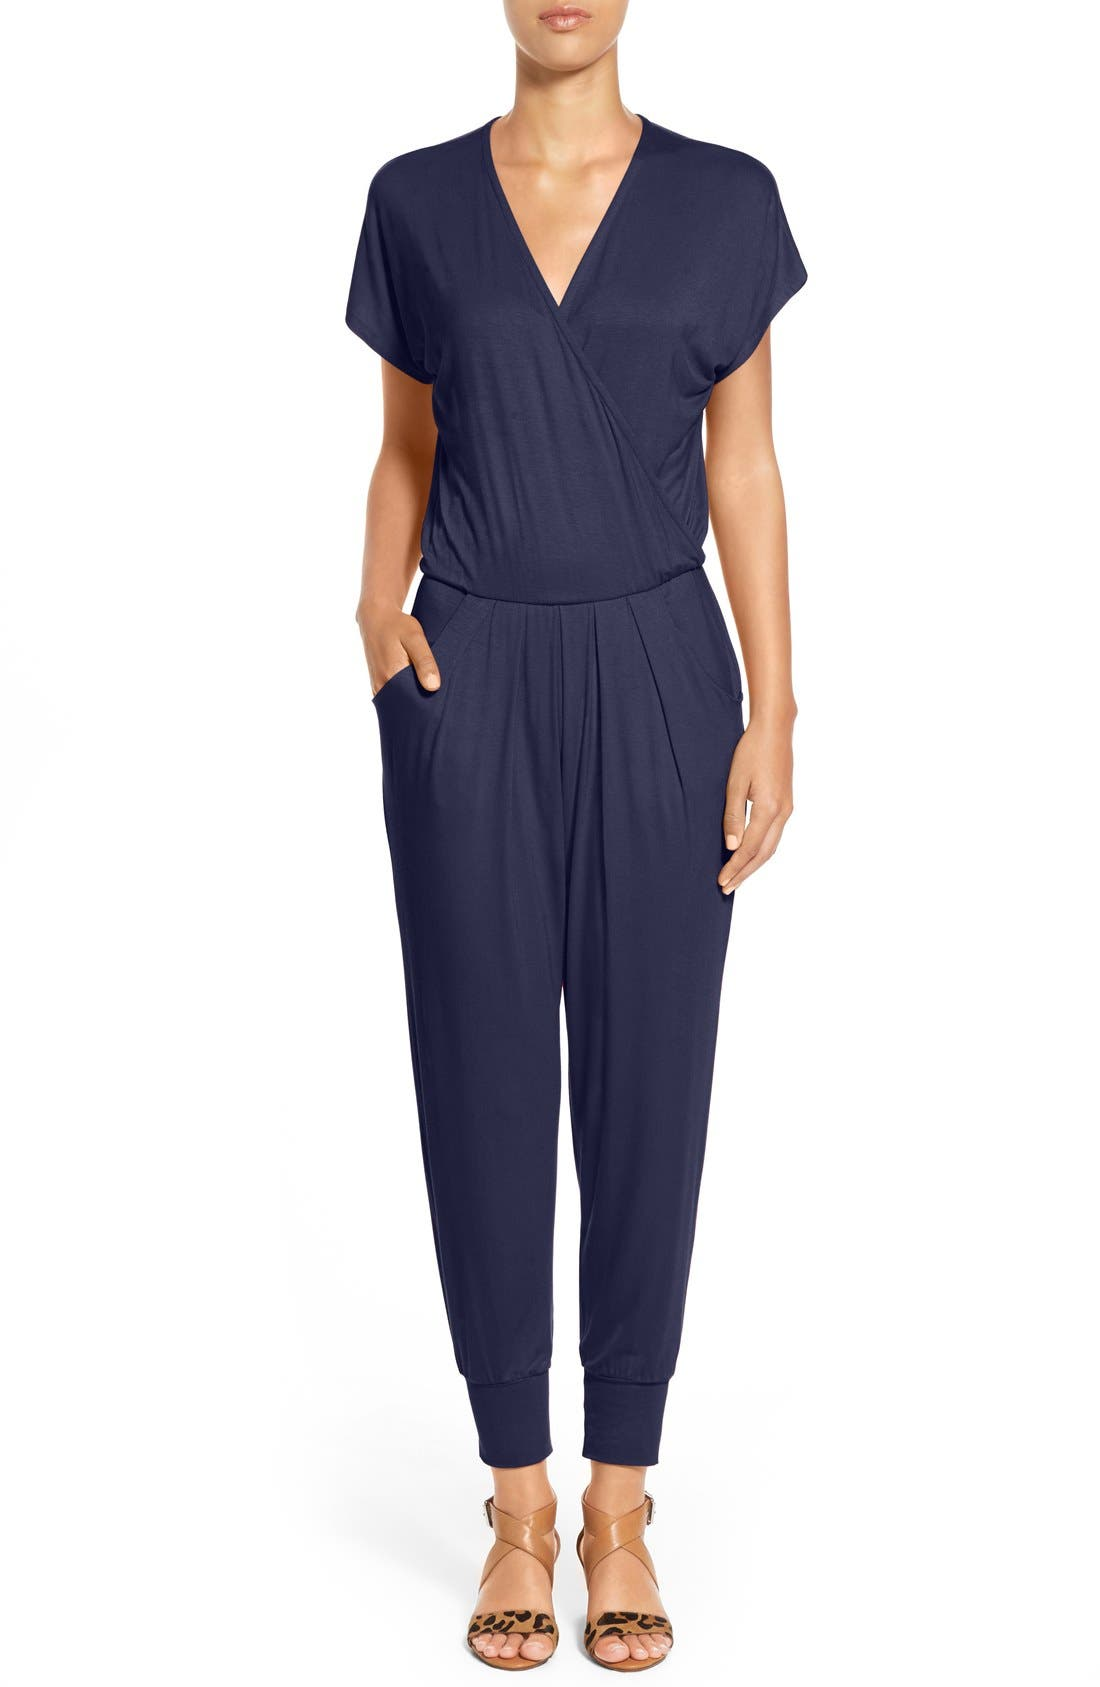 Main Image - Loveappella Short Sleeve Wrap Top Jumpsuit (Regular & Petite)